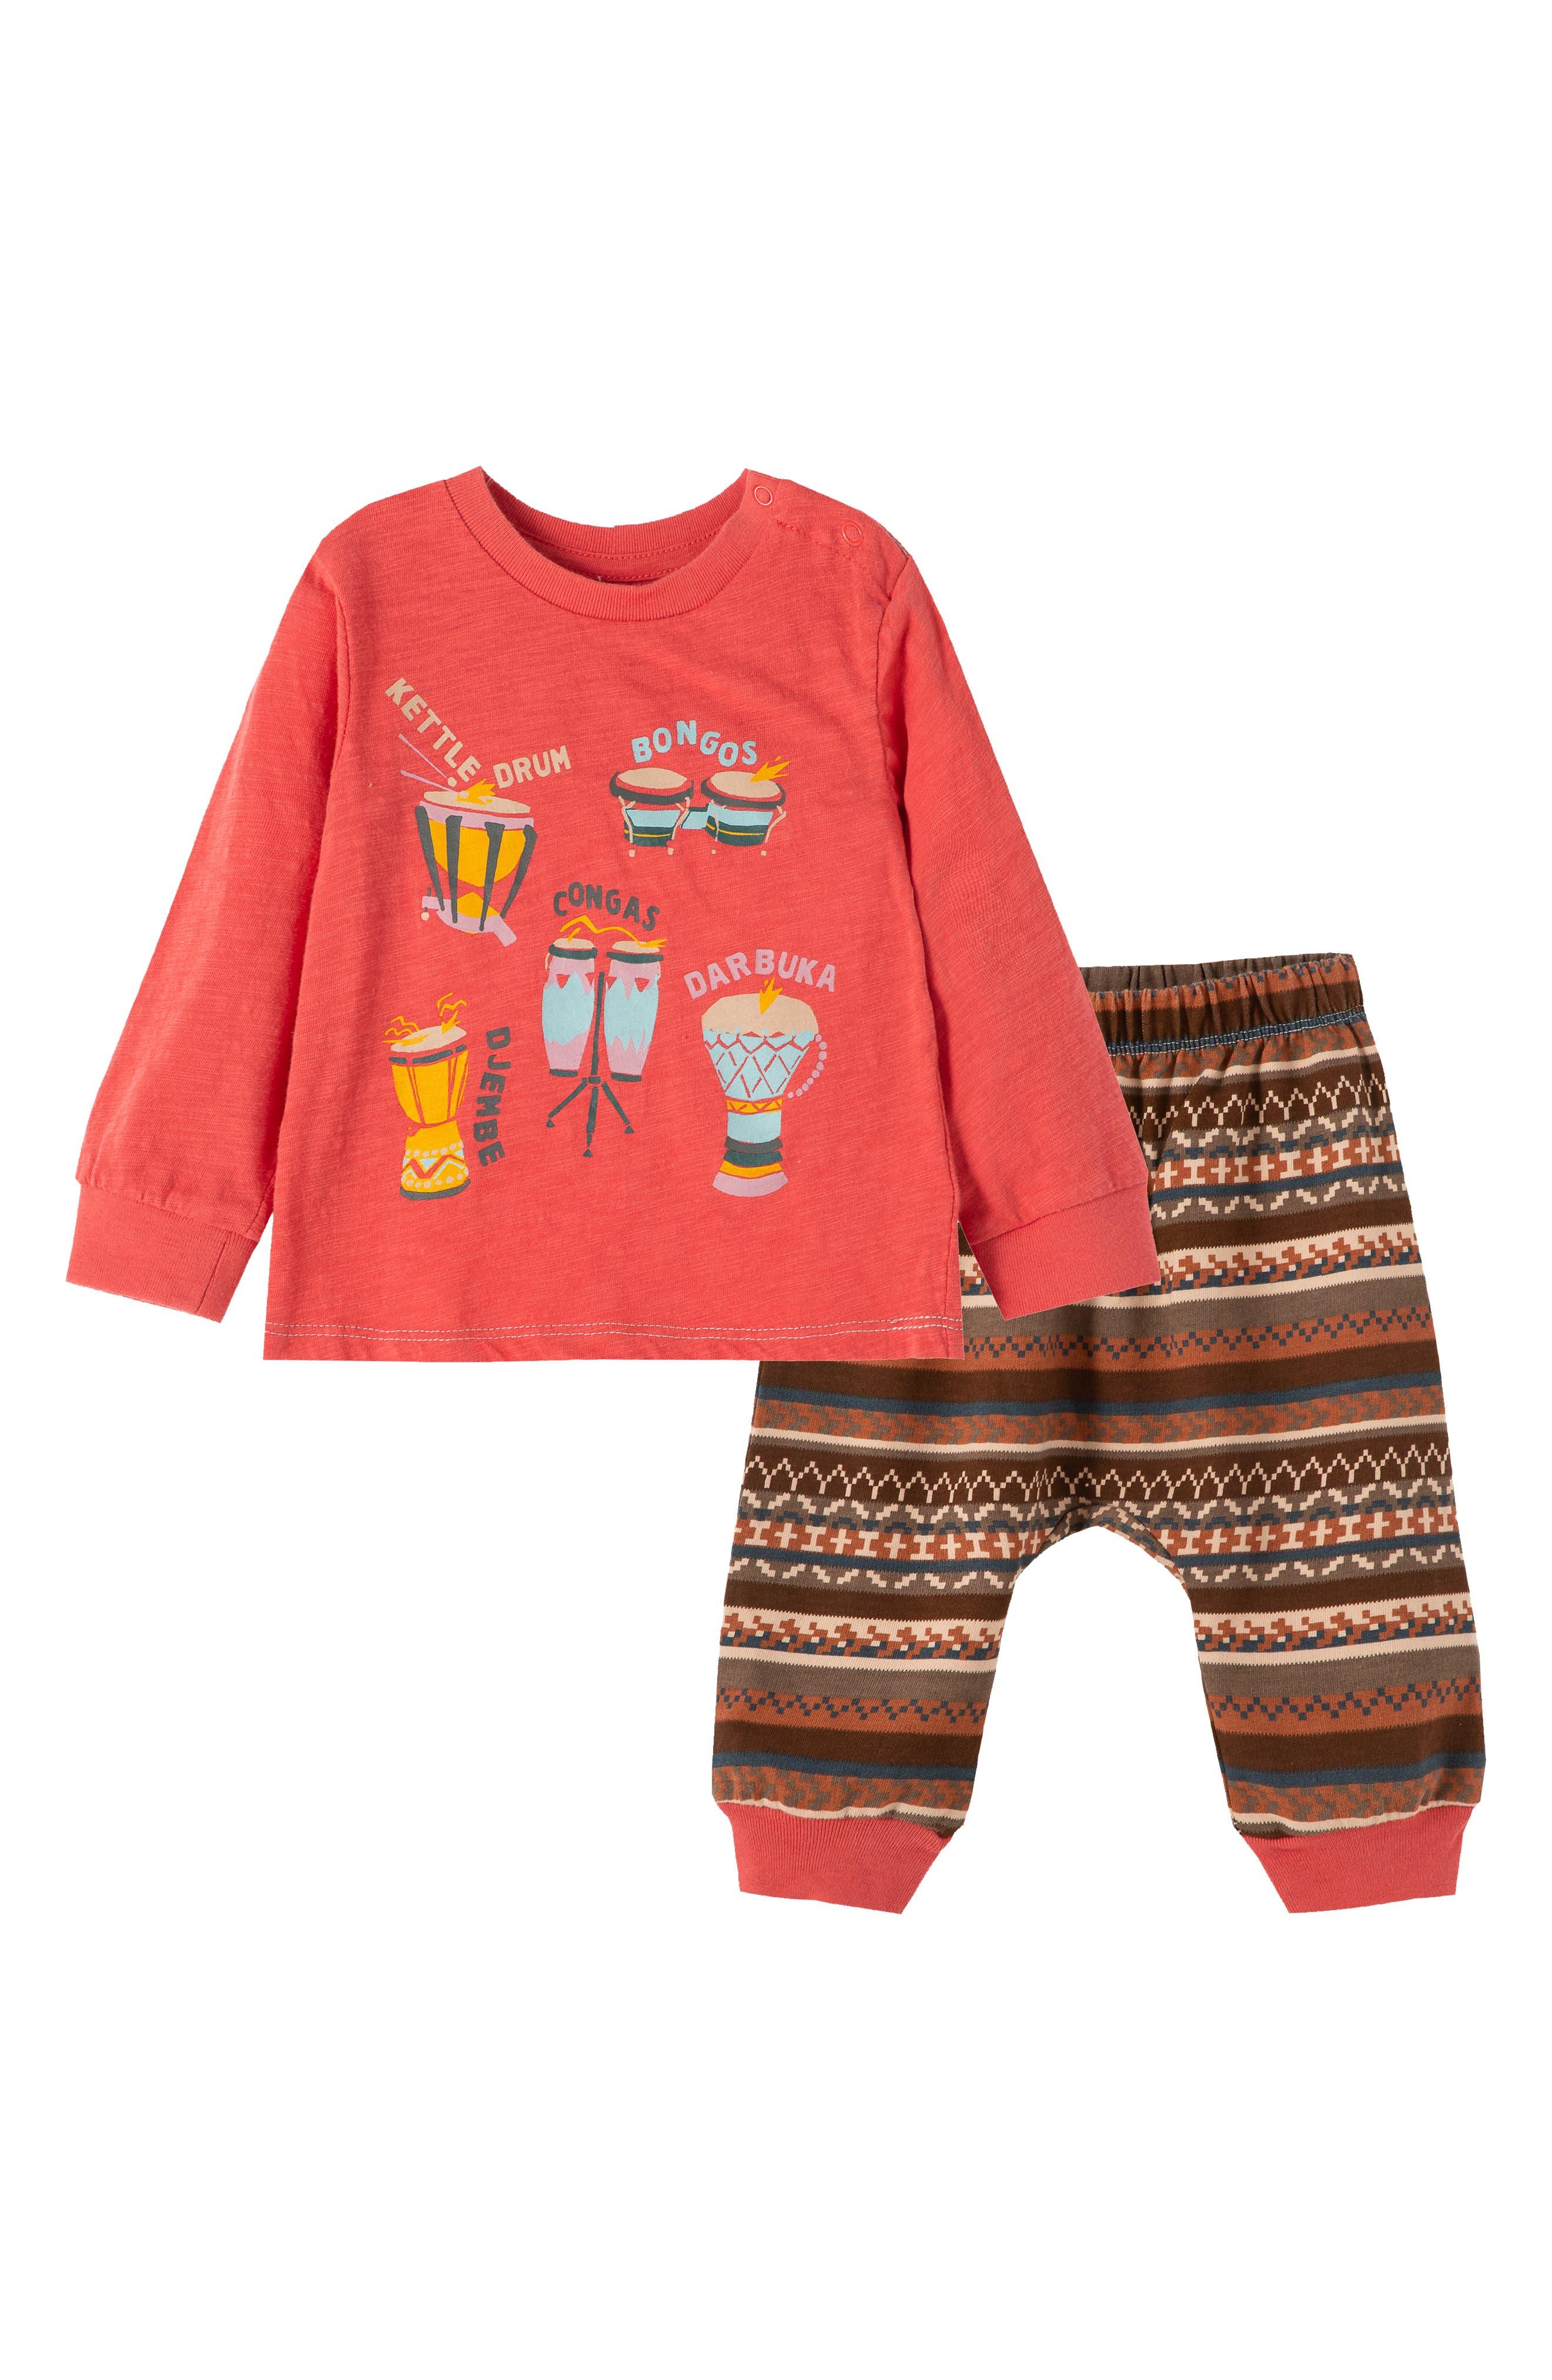 Peek Essentials Infant Boy's Peek Essentials Never Too Young To Make Music Shirt & Pants Set